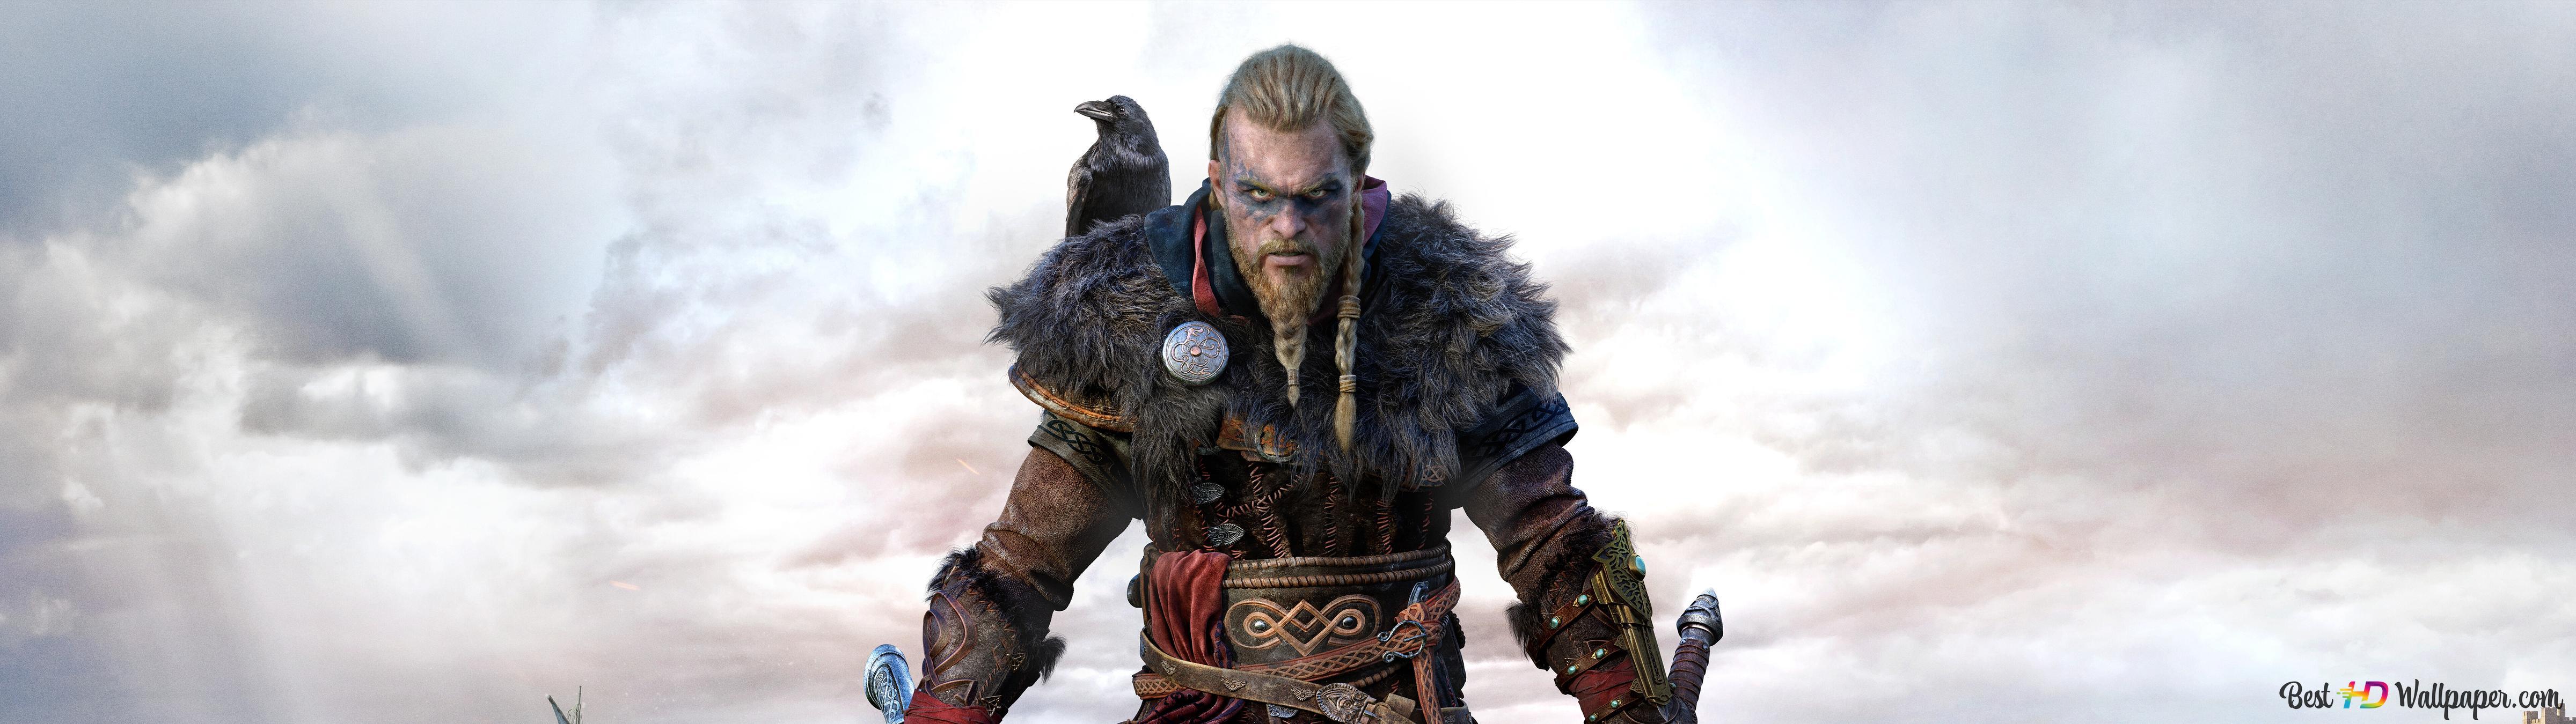 Assassin S Creed Valhalla Eivor Viking Clan Hd Wallpaper Download